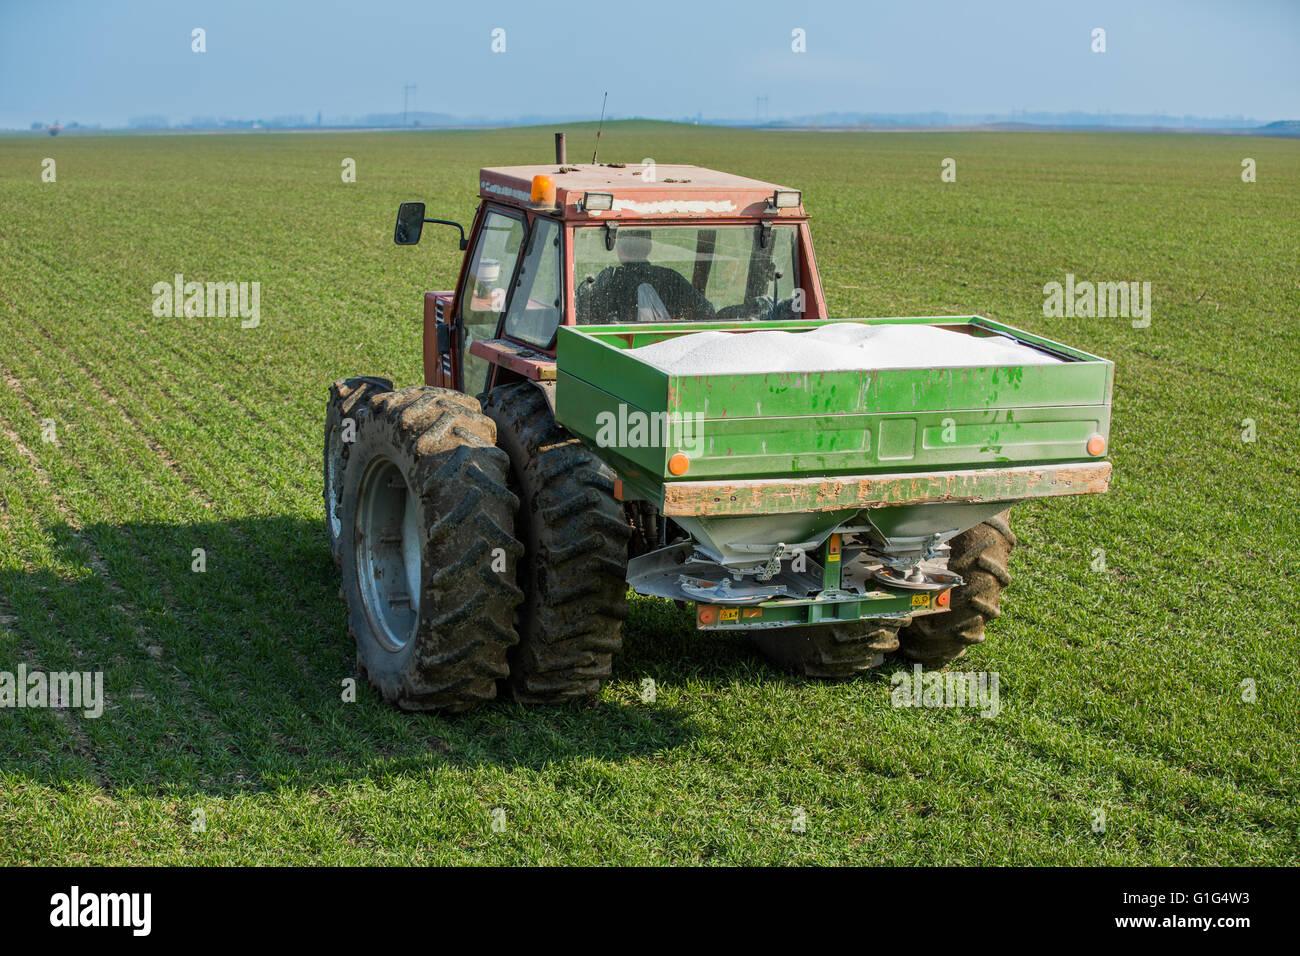 Farmer fertilizing wheat with nitrogen, phosphorus, potassium fertilizer - Stock Image